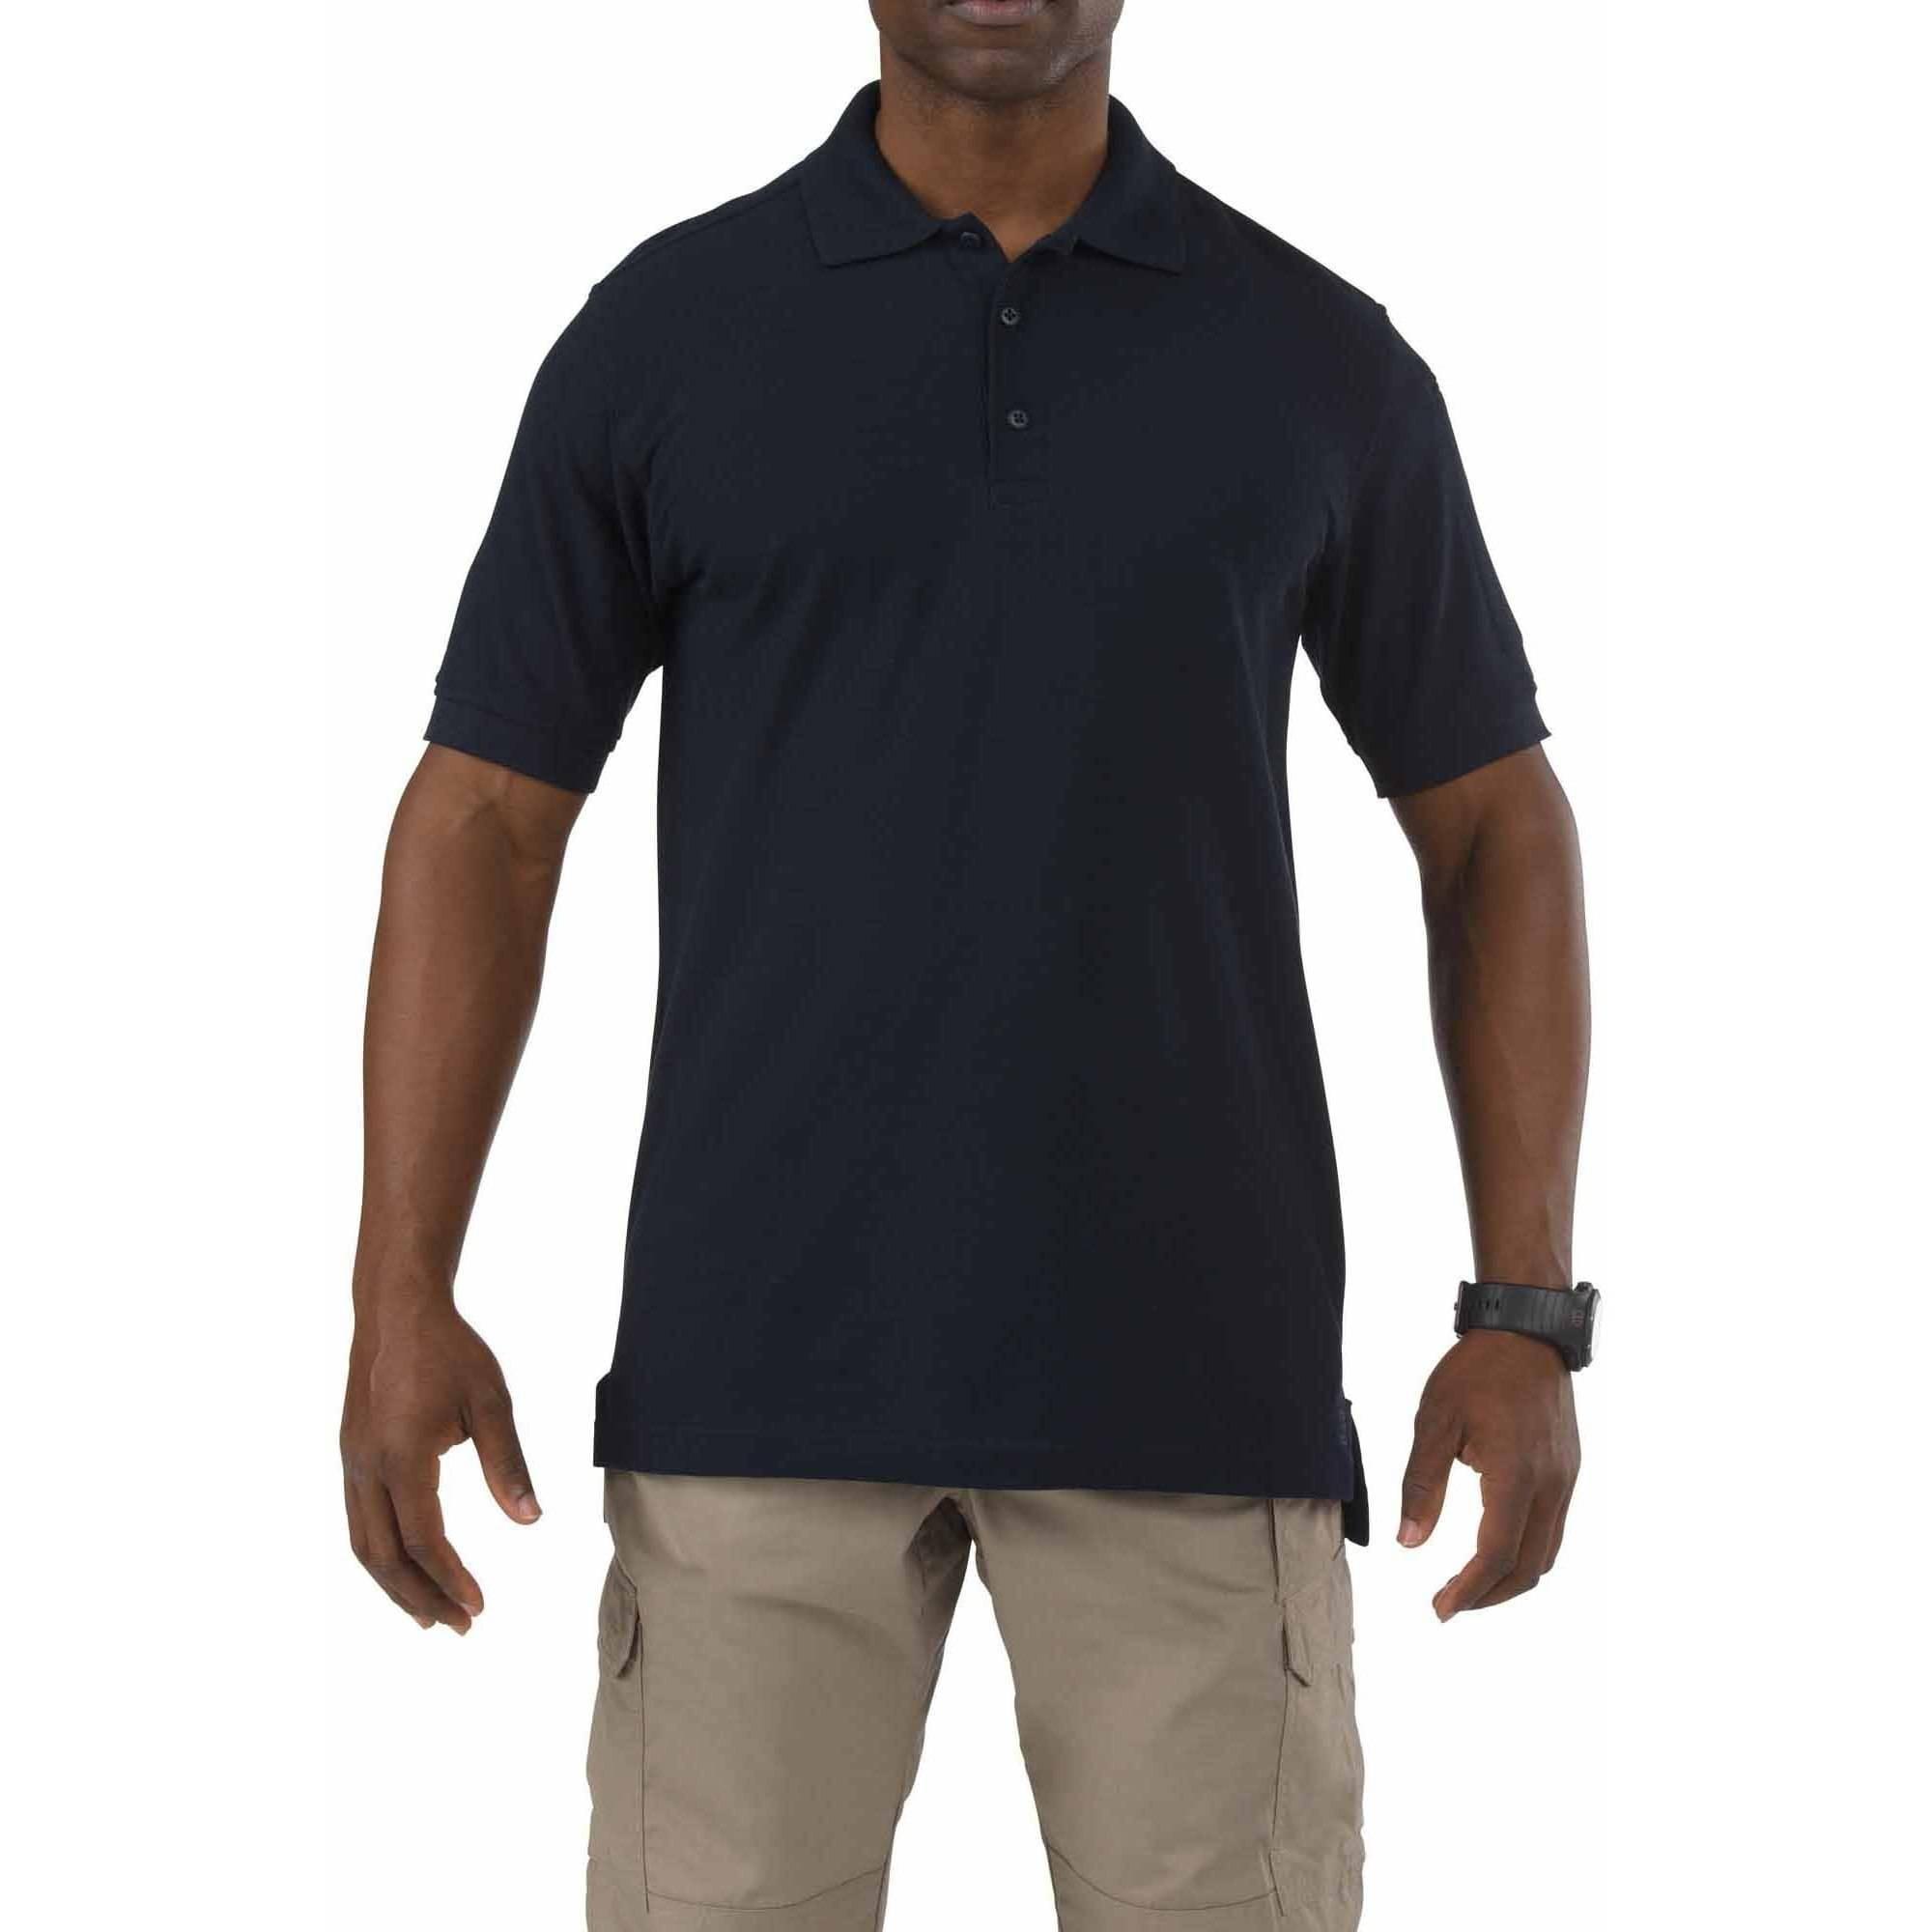 5.11 Tactical Short Sleeve Utility Polo, Dark Navy